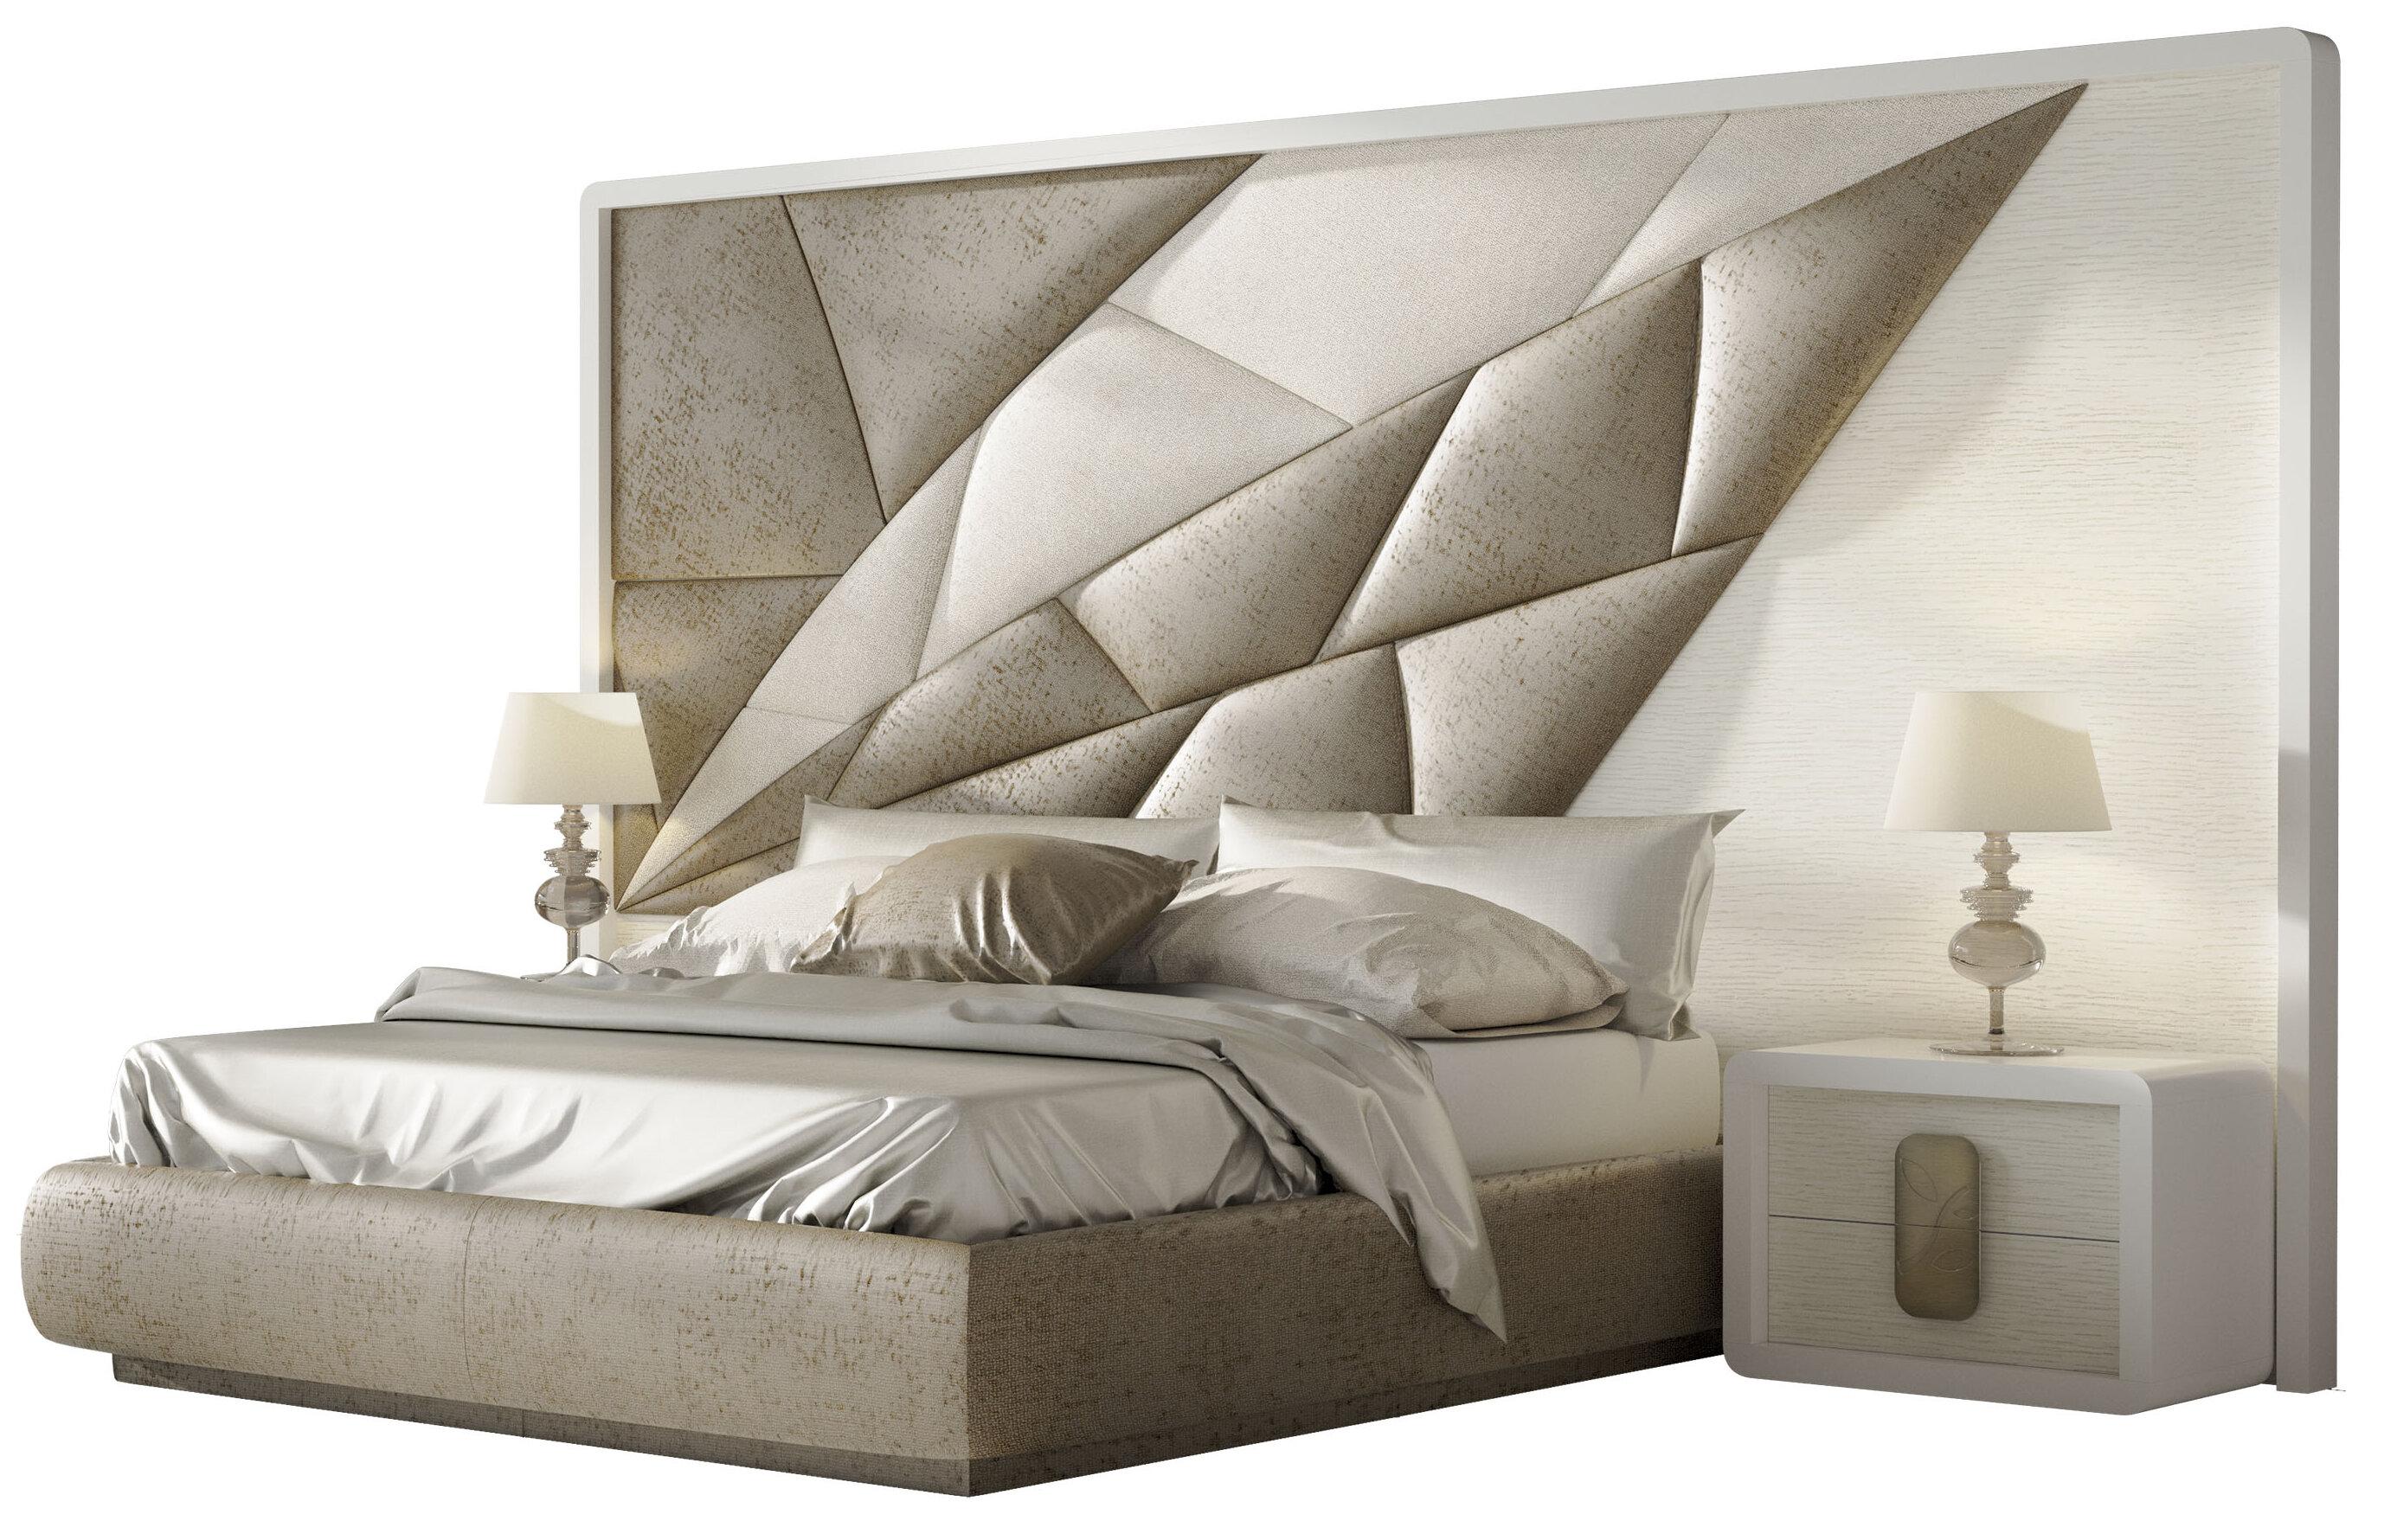 Hispania Home London Bedor166 Bedroom Wayfair